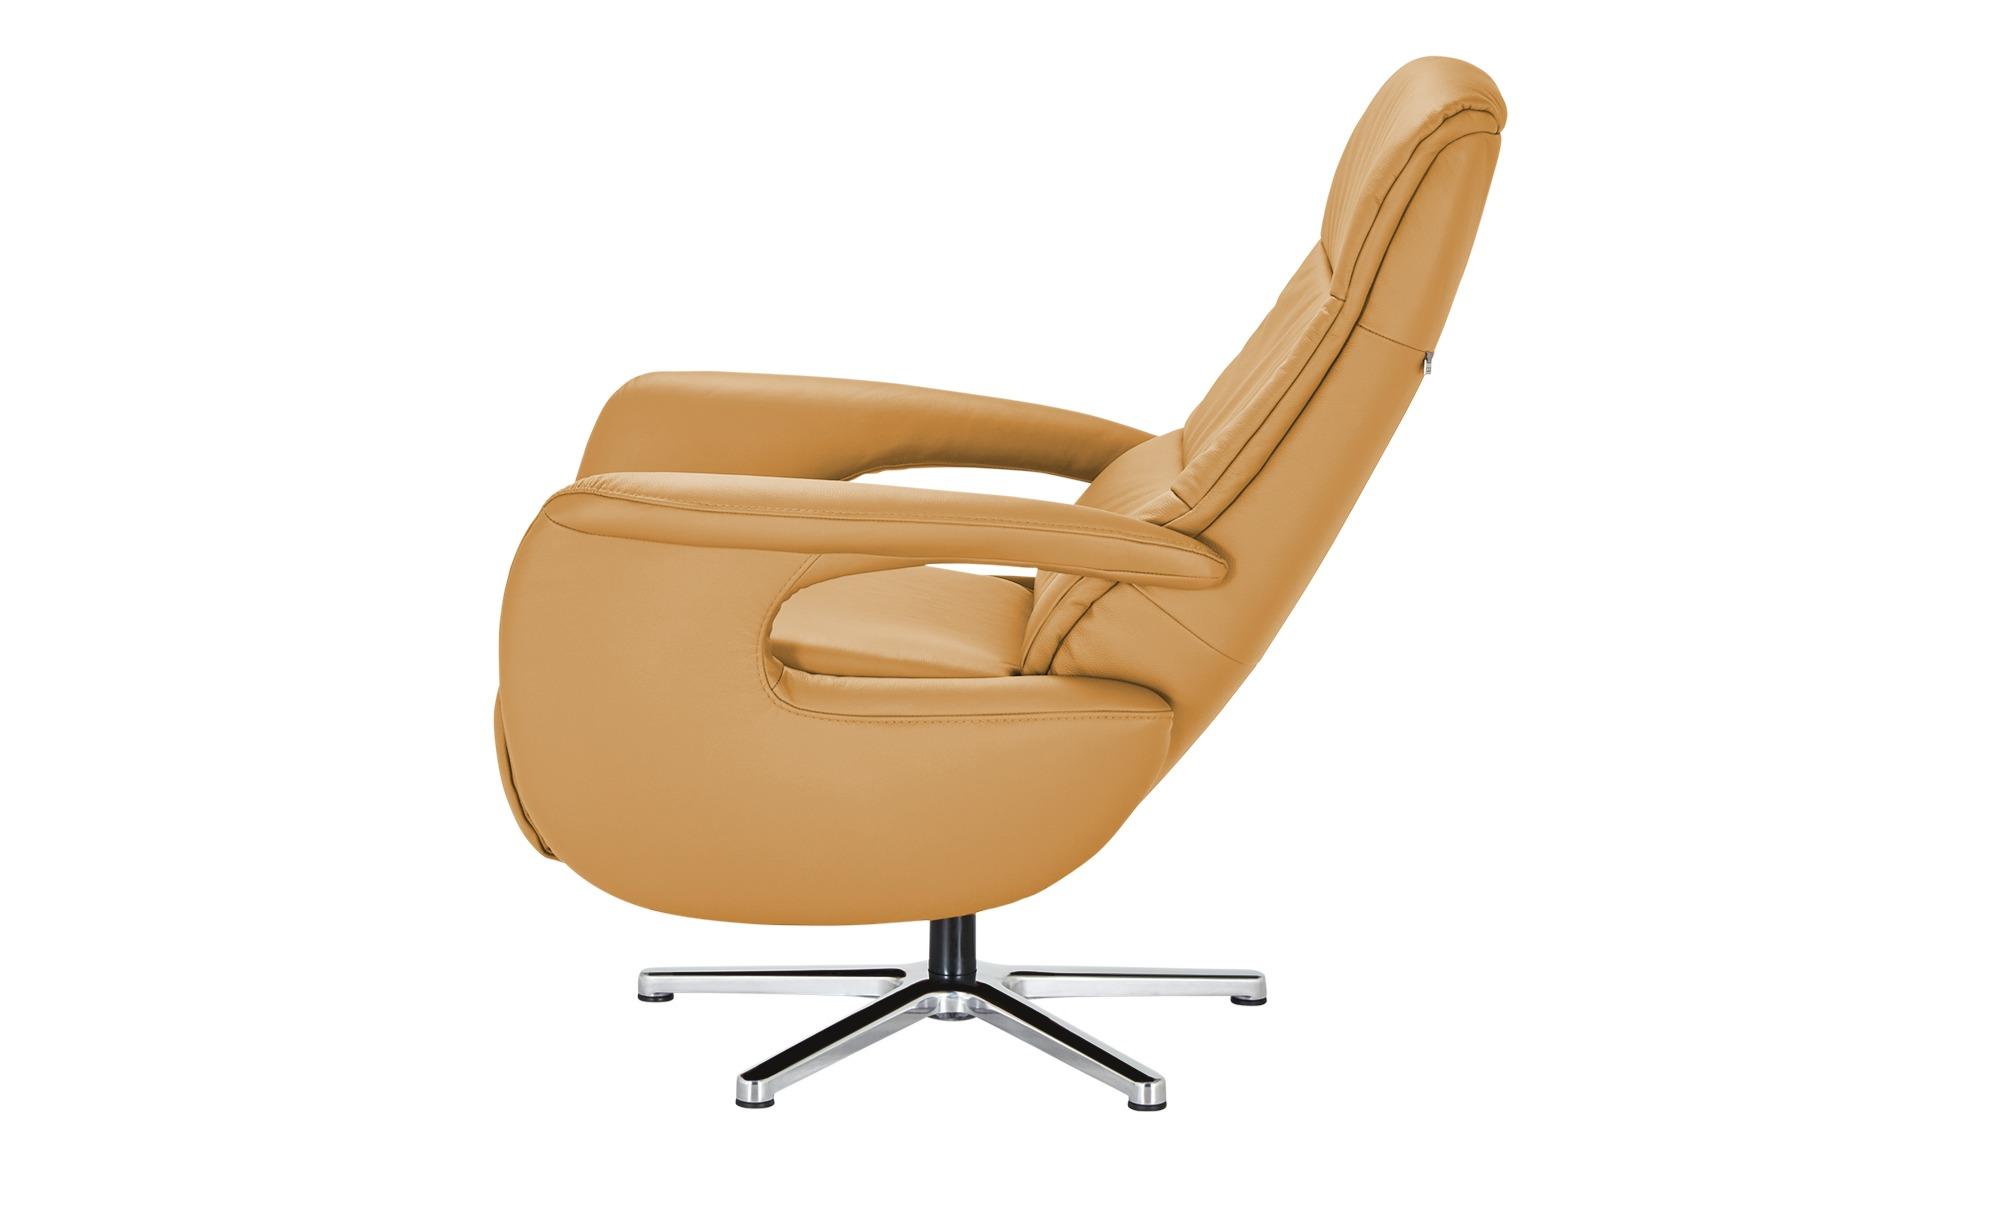 Hukla Relaxsessel  Enno ¦ gelb ¦ Maße (cm): B: 72 H: 110 T: 85 Polstermöbel > Sessel > Fernsehsessel - Höffner